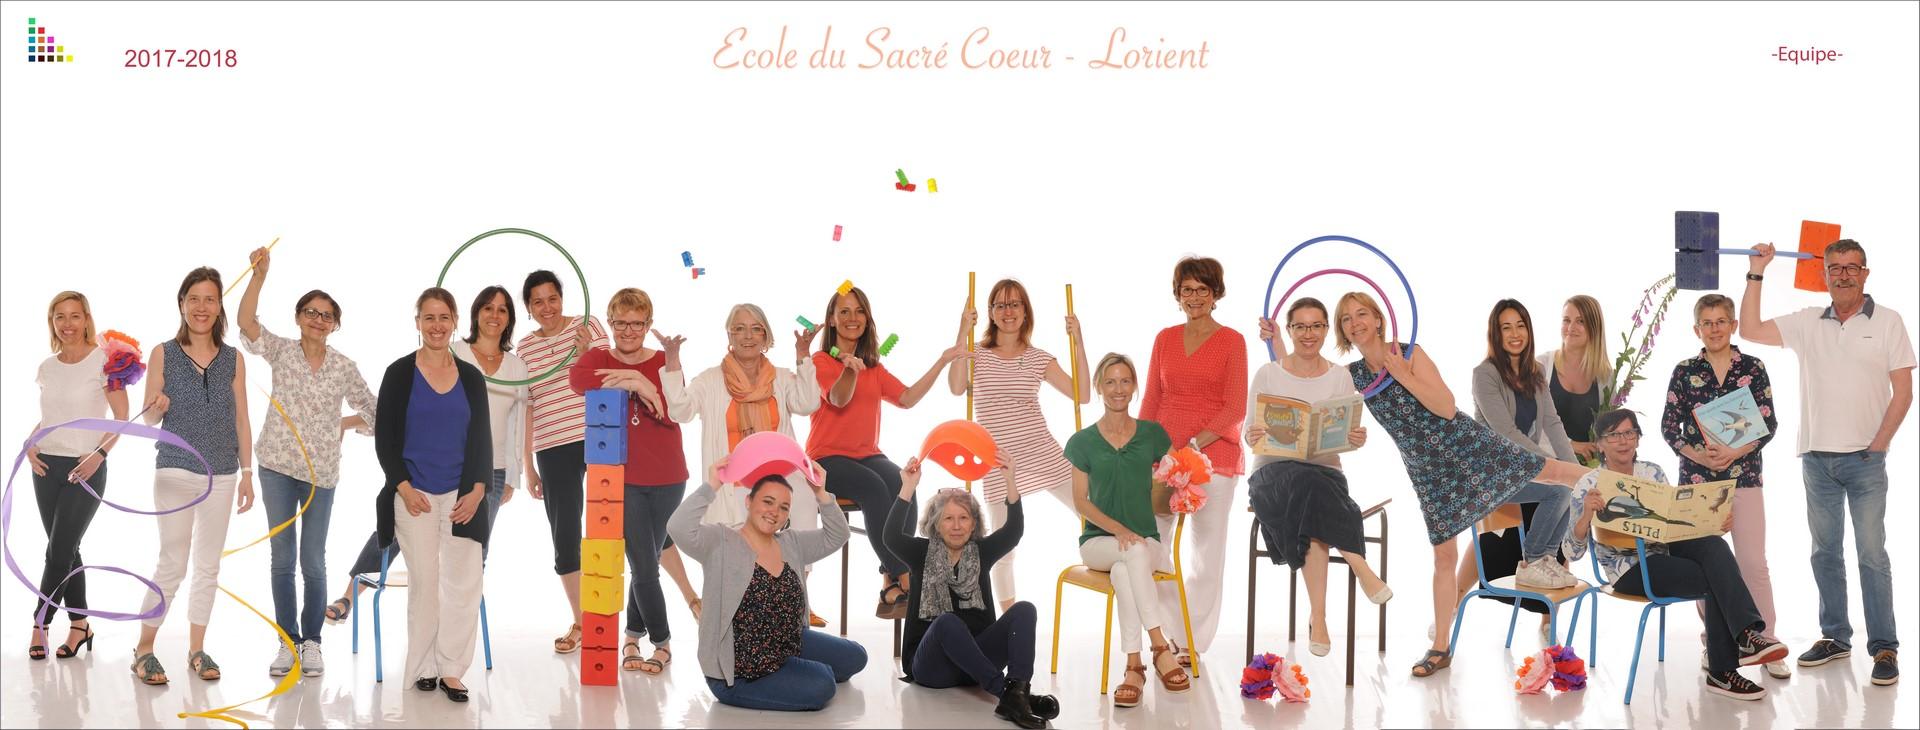 -EquipeSacreCoeur- (Copier)